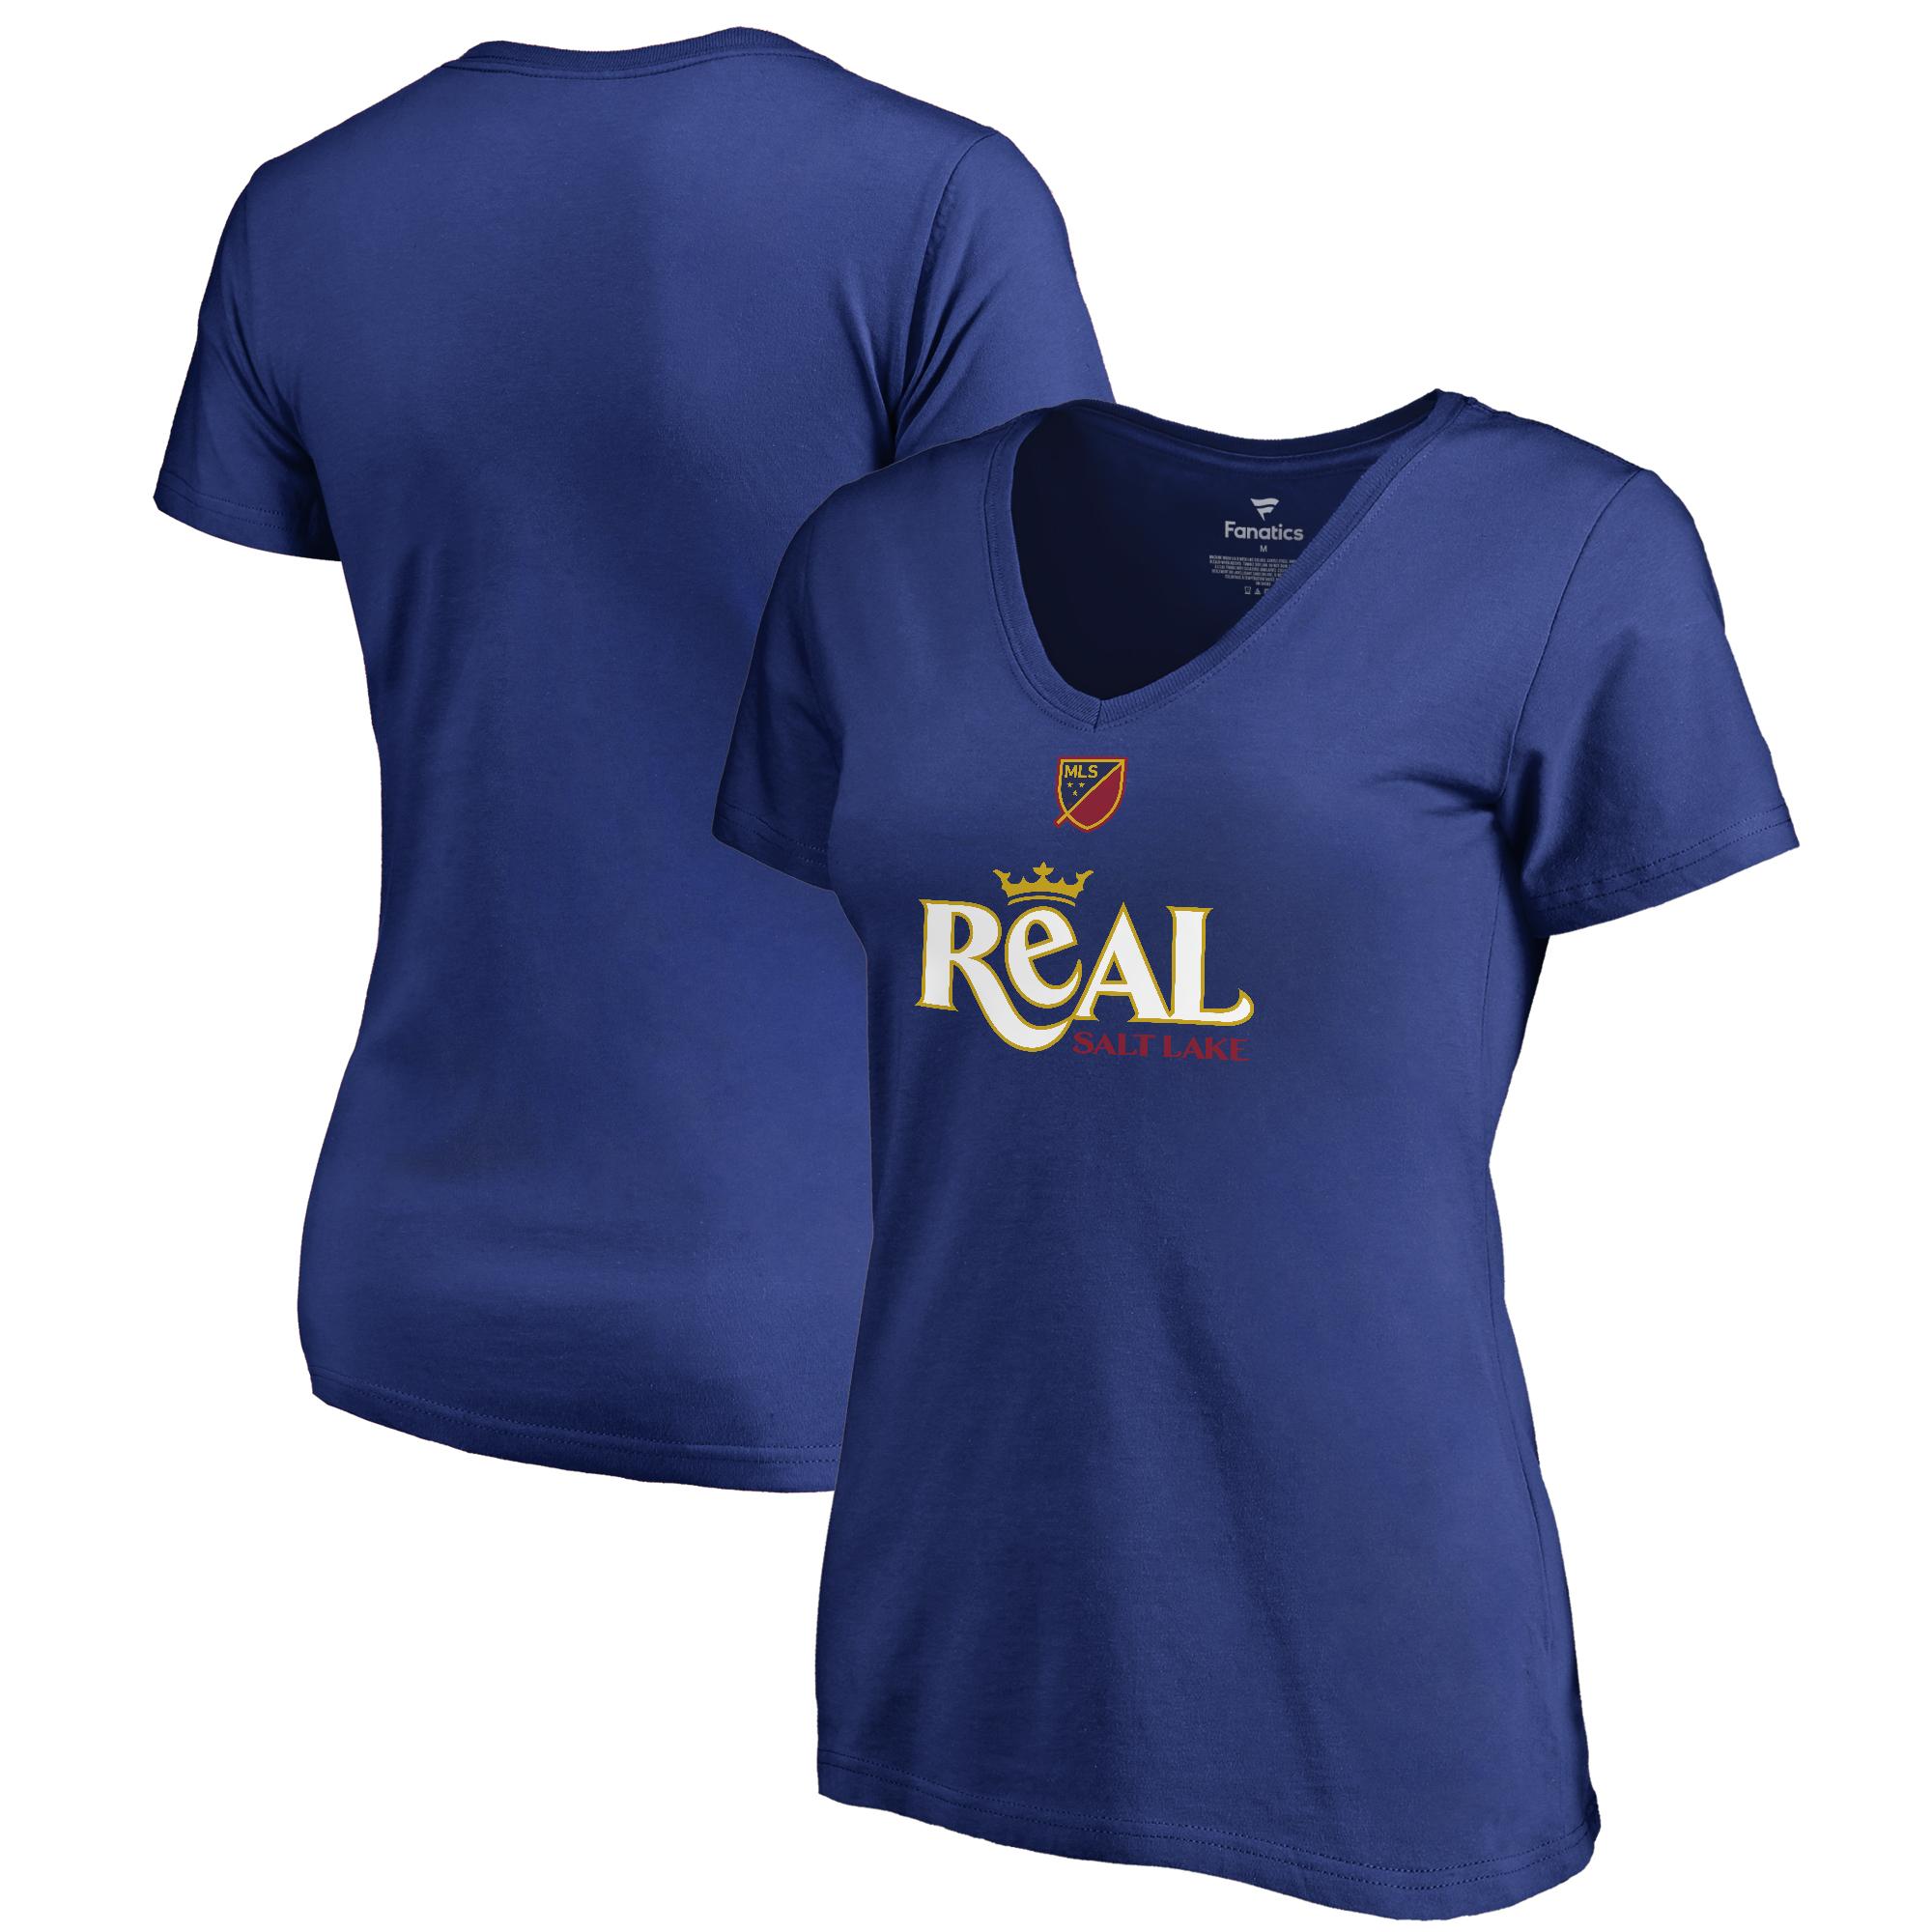 Real Salt Lake Fanatics Branded Women's Shielded V-Neck T-Shirt - Royal